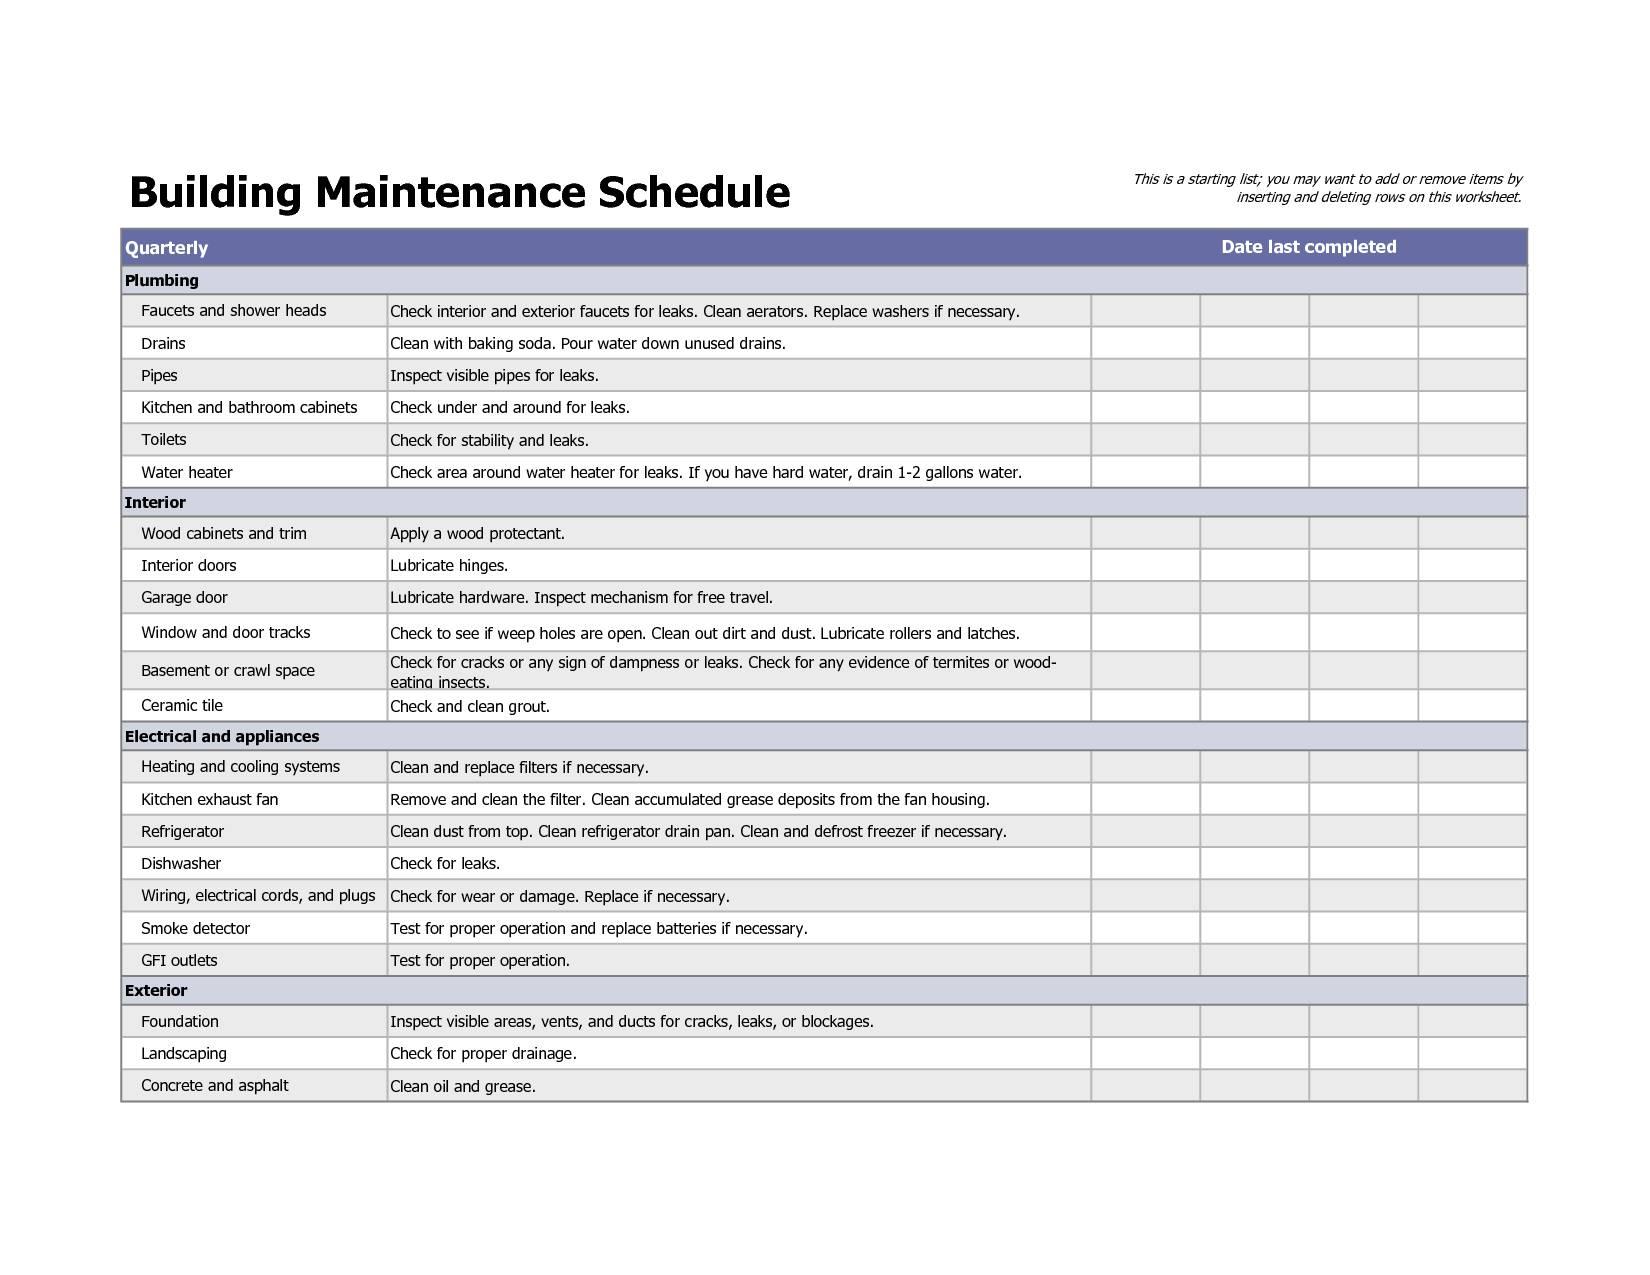 Preventive Maintenance Templates For Excel